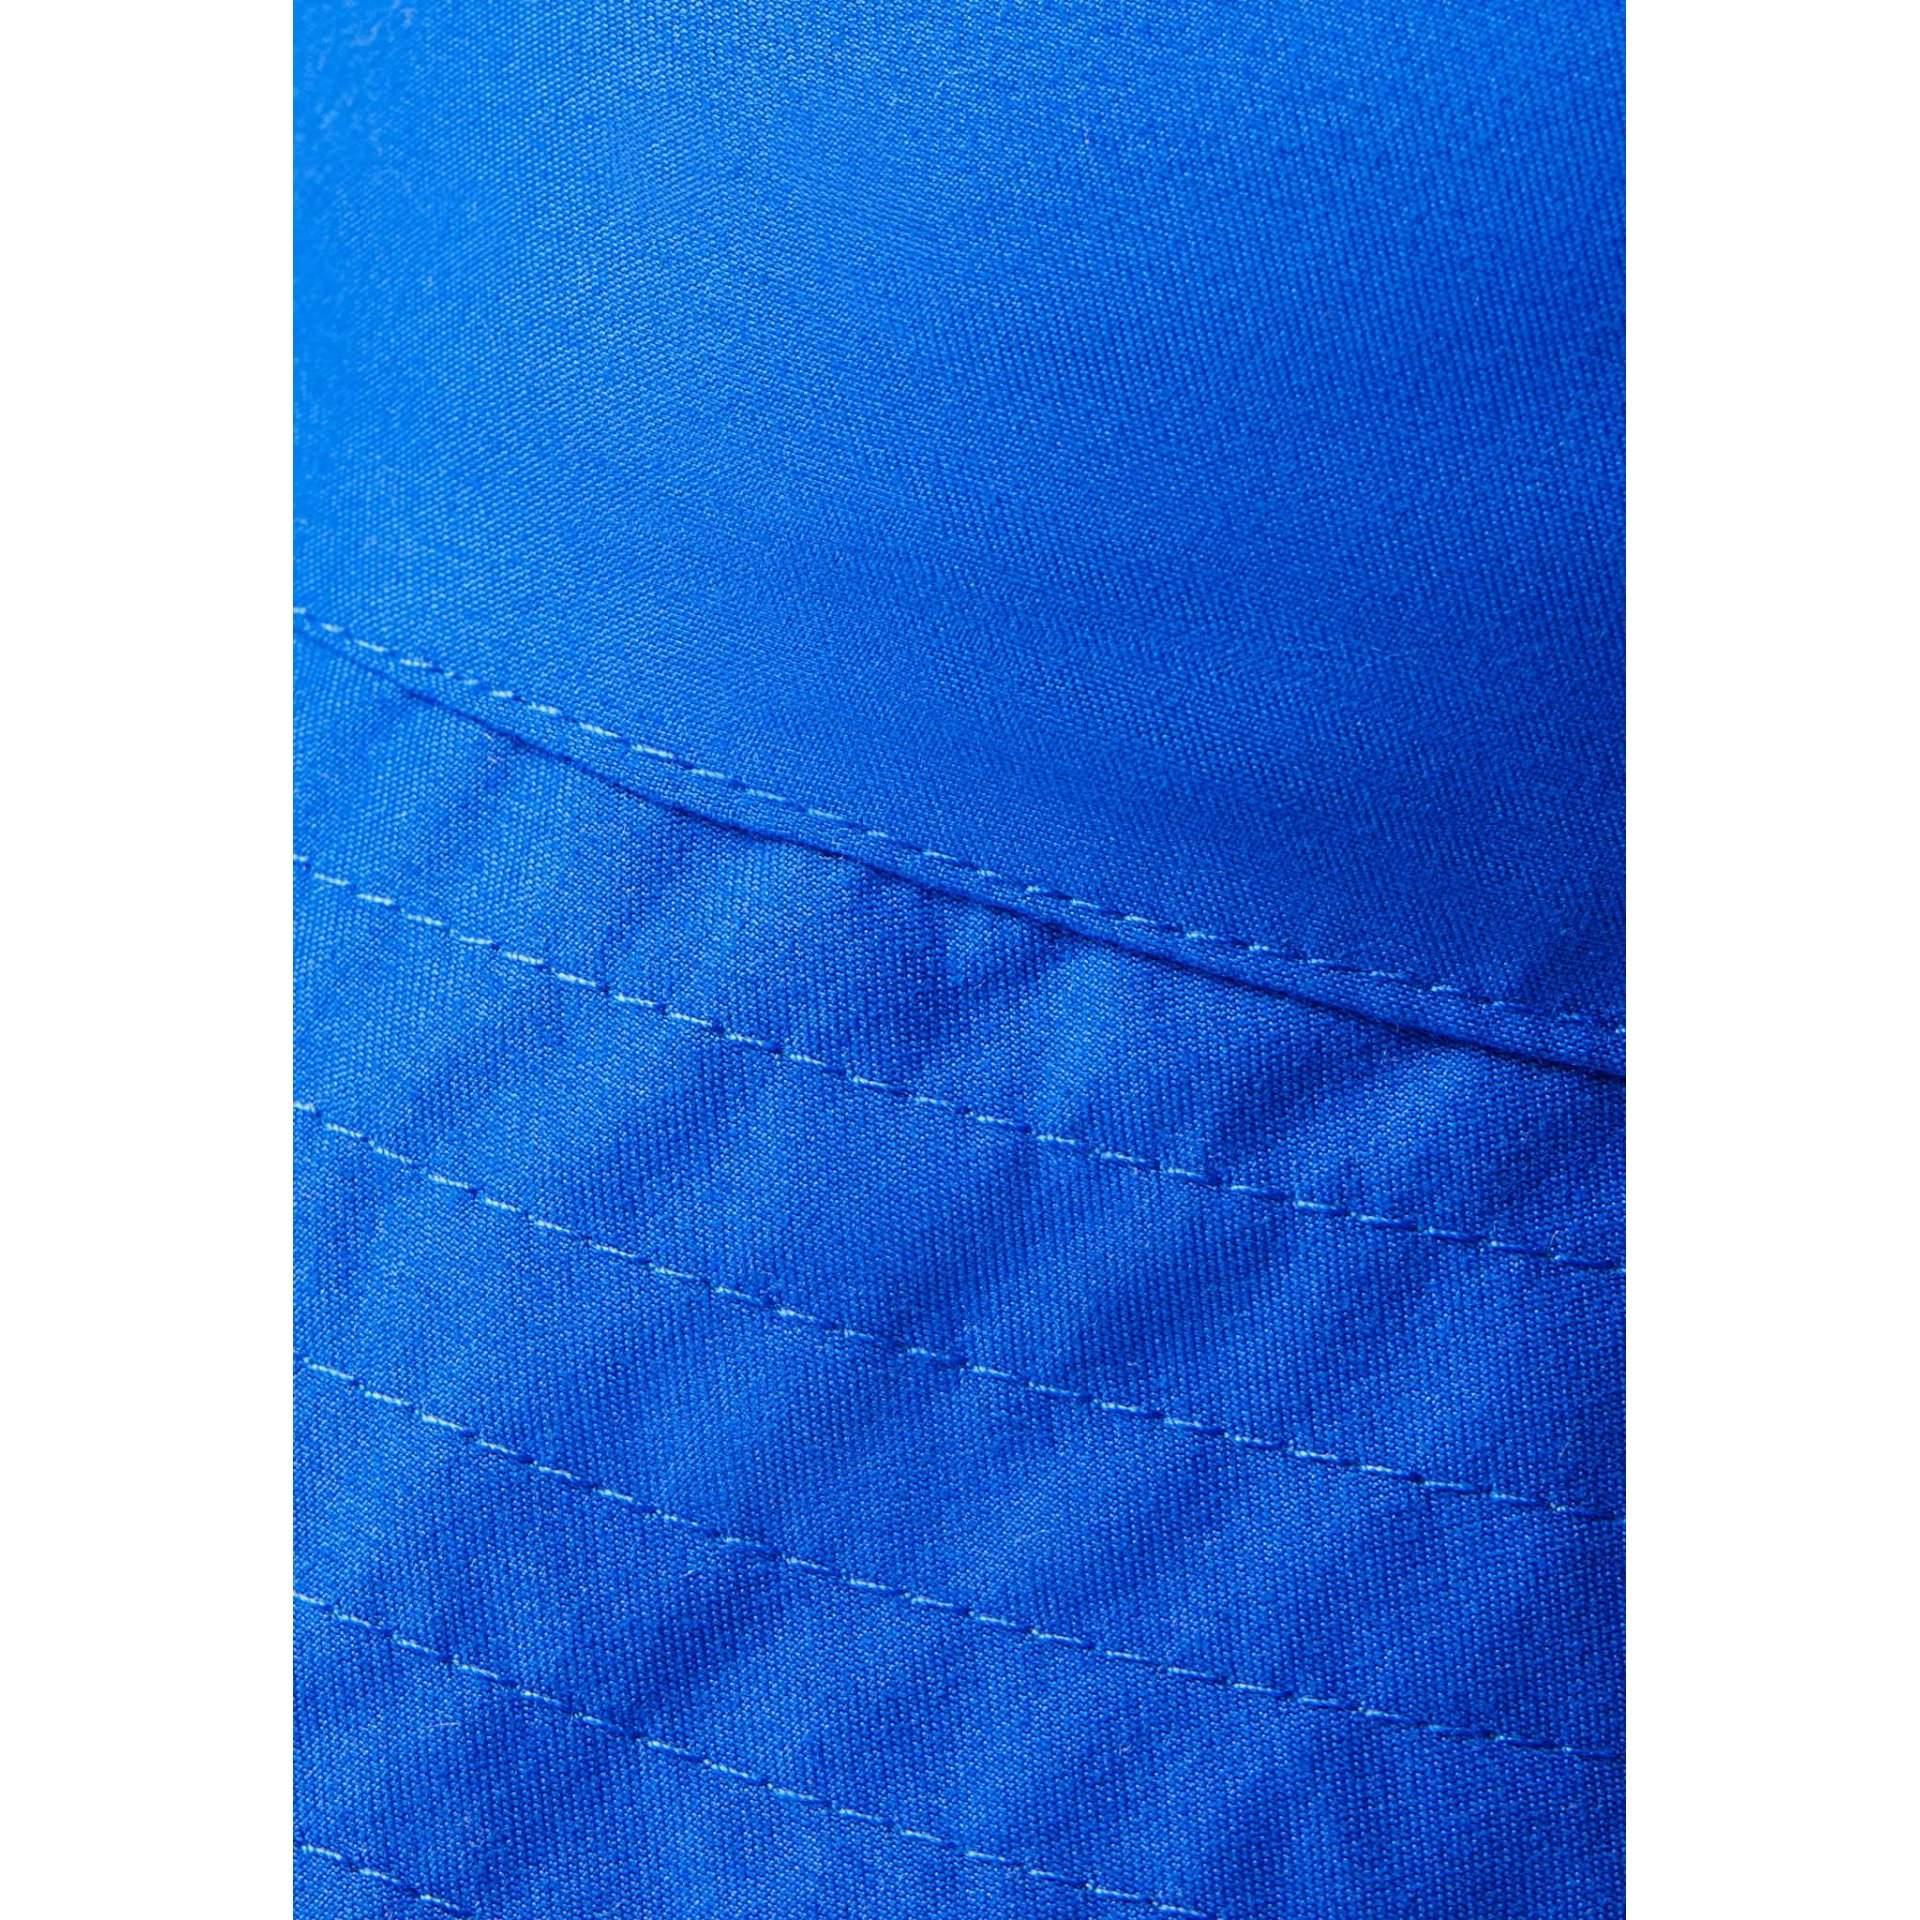 KAPELUSZ REIMA VIEHE 6680 BLUE SZWY